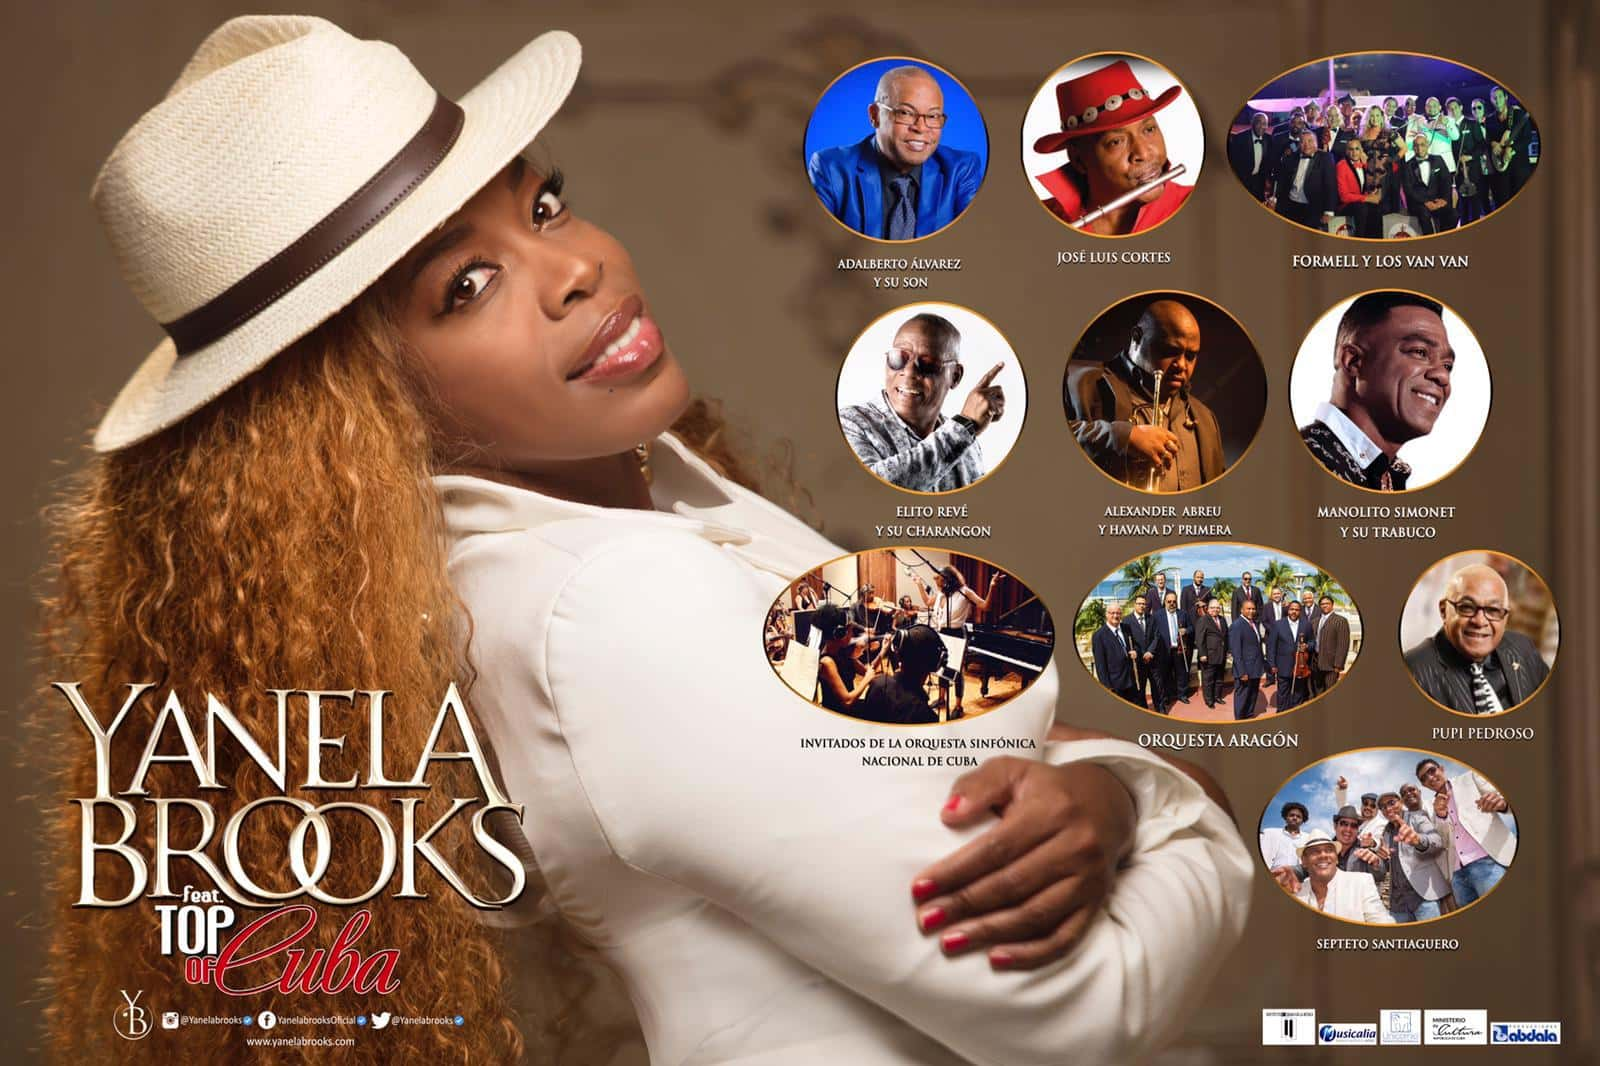 Yanela Brooks disco top of cuba.jpeg